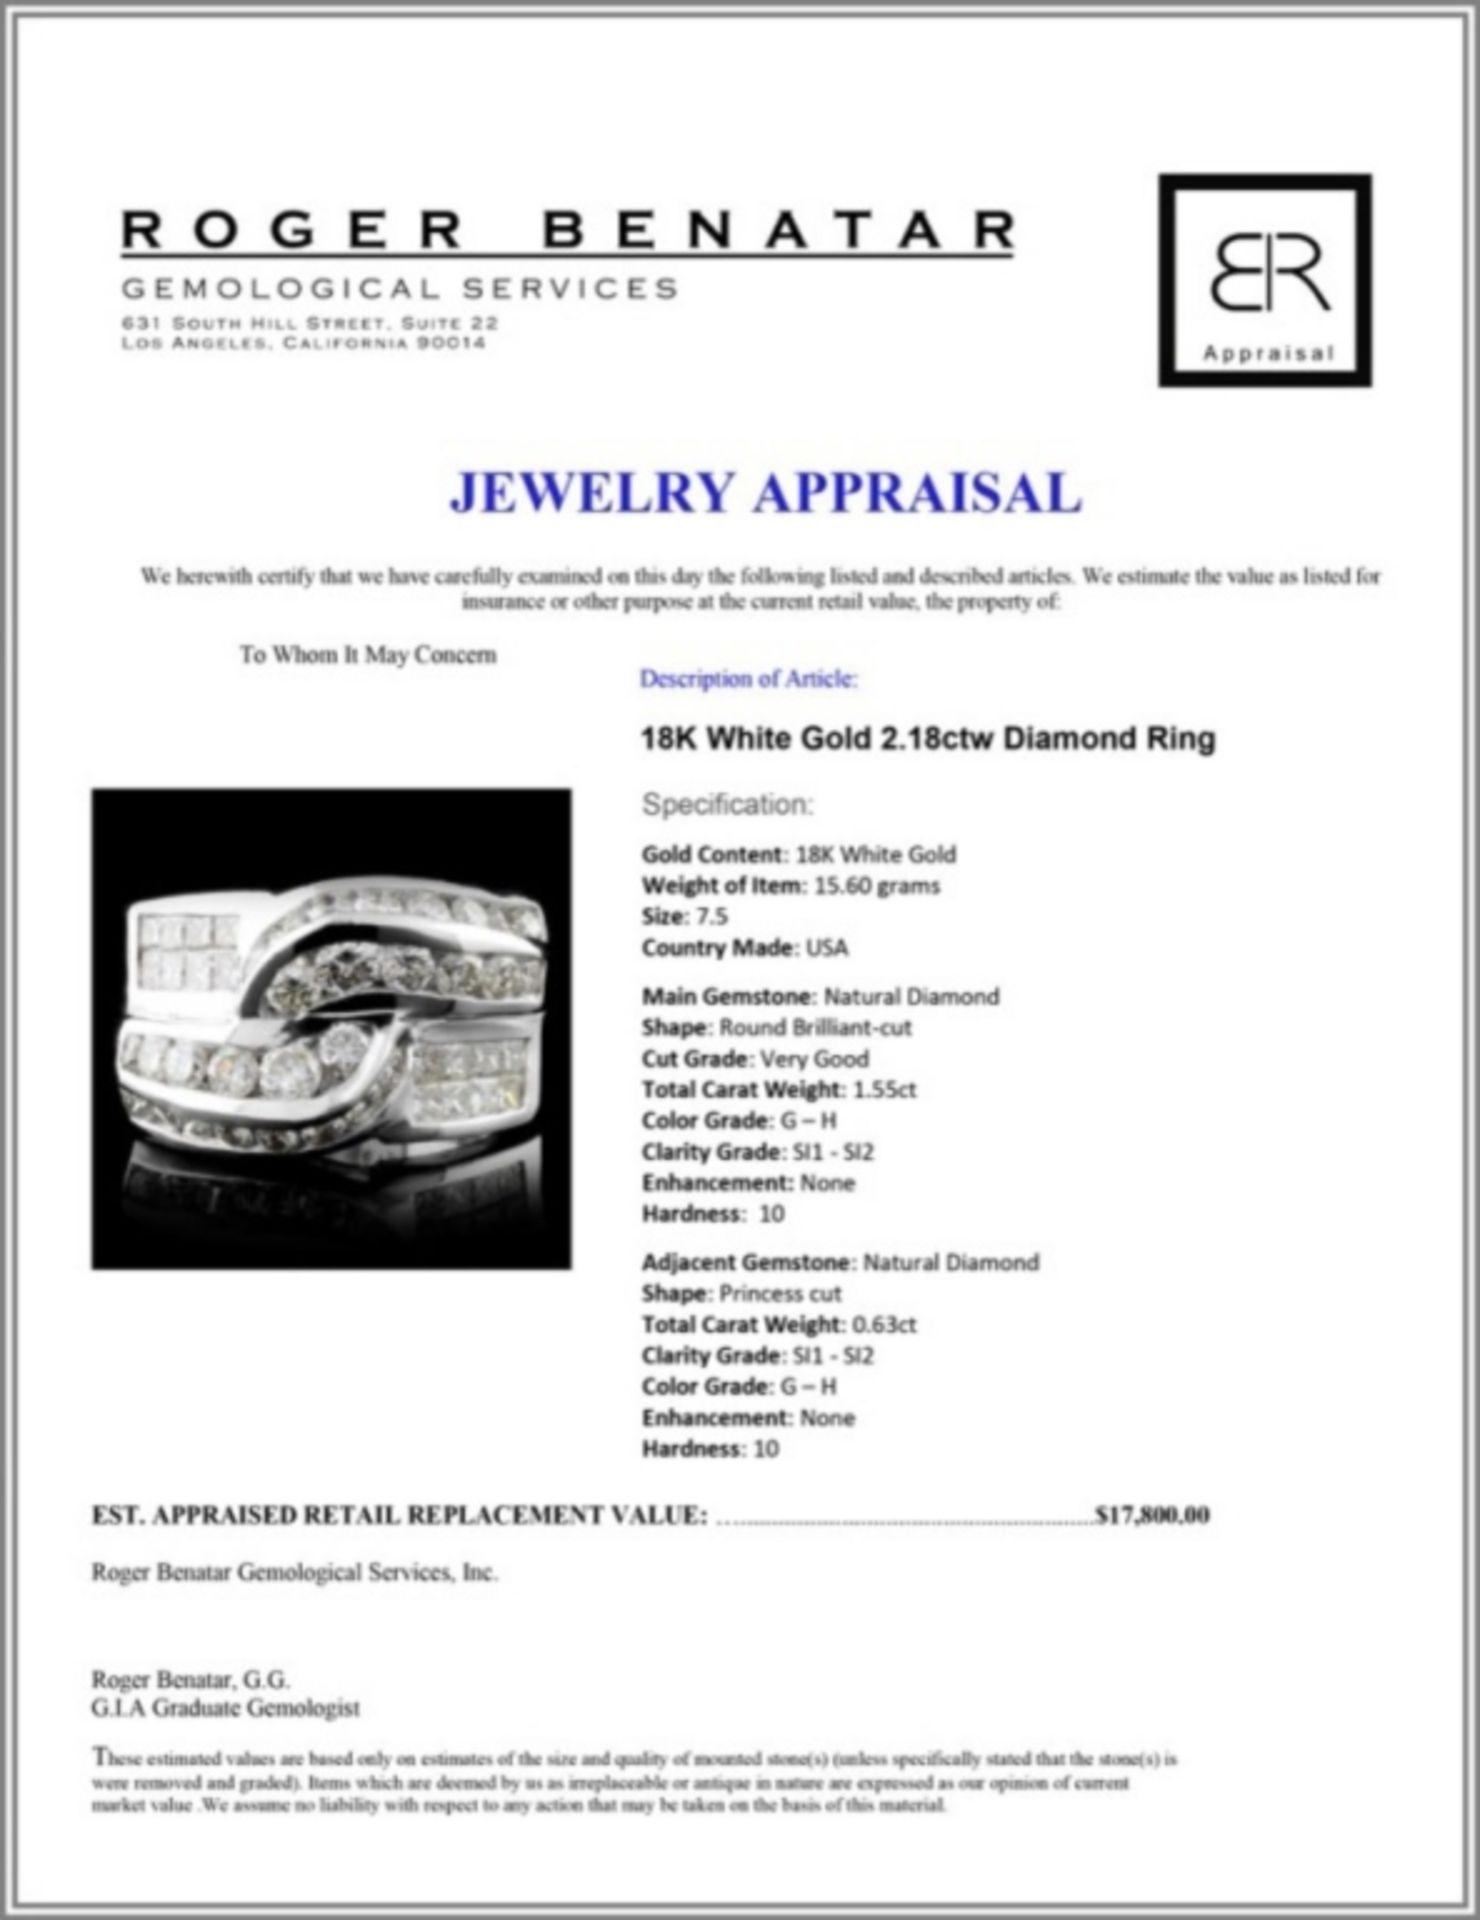 18K White Gold 2.18ctw Diamond Ring - Image 3 of 3